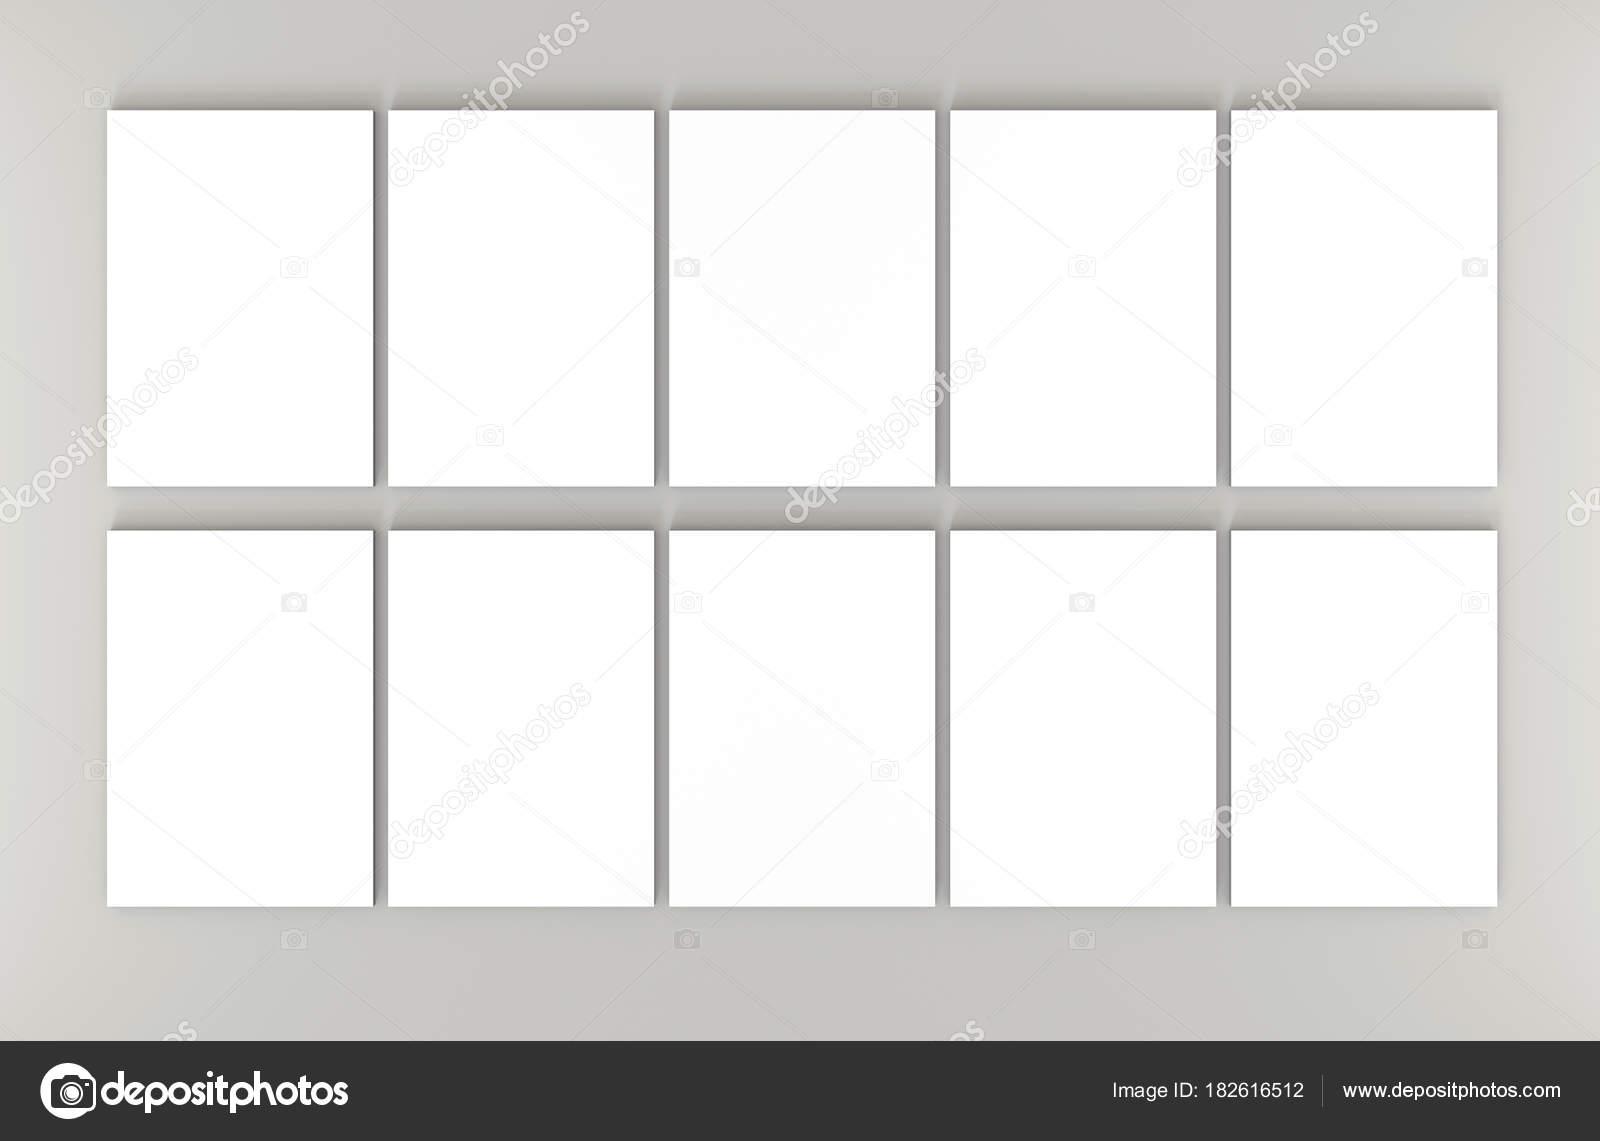 Diez blanco A4 hojas de papel sobre fondo gris. Render 3d de alta ...